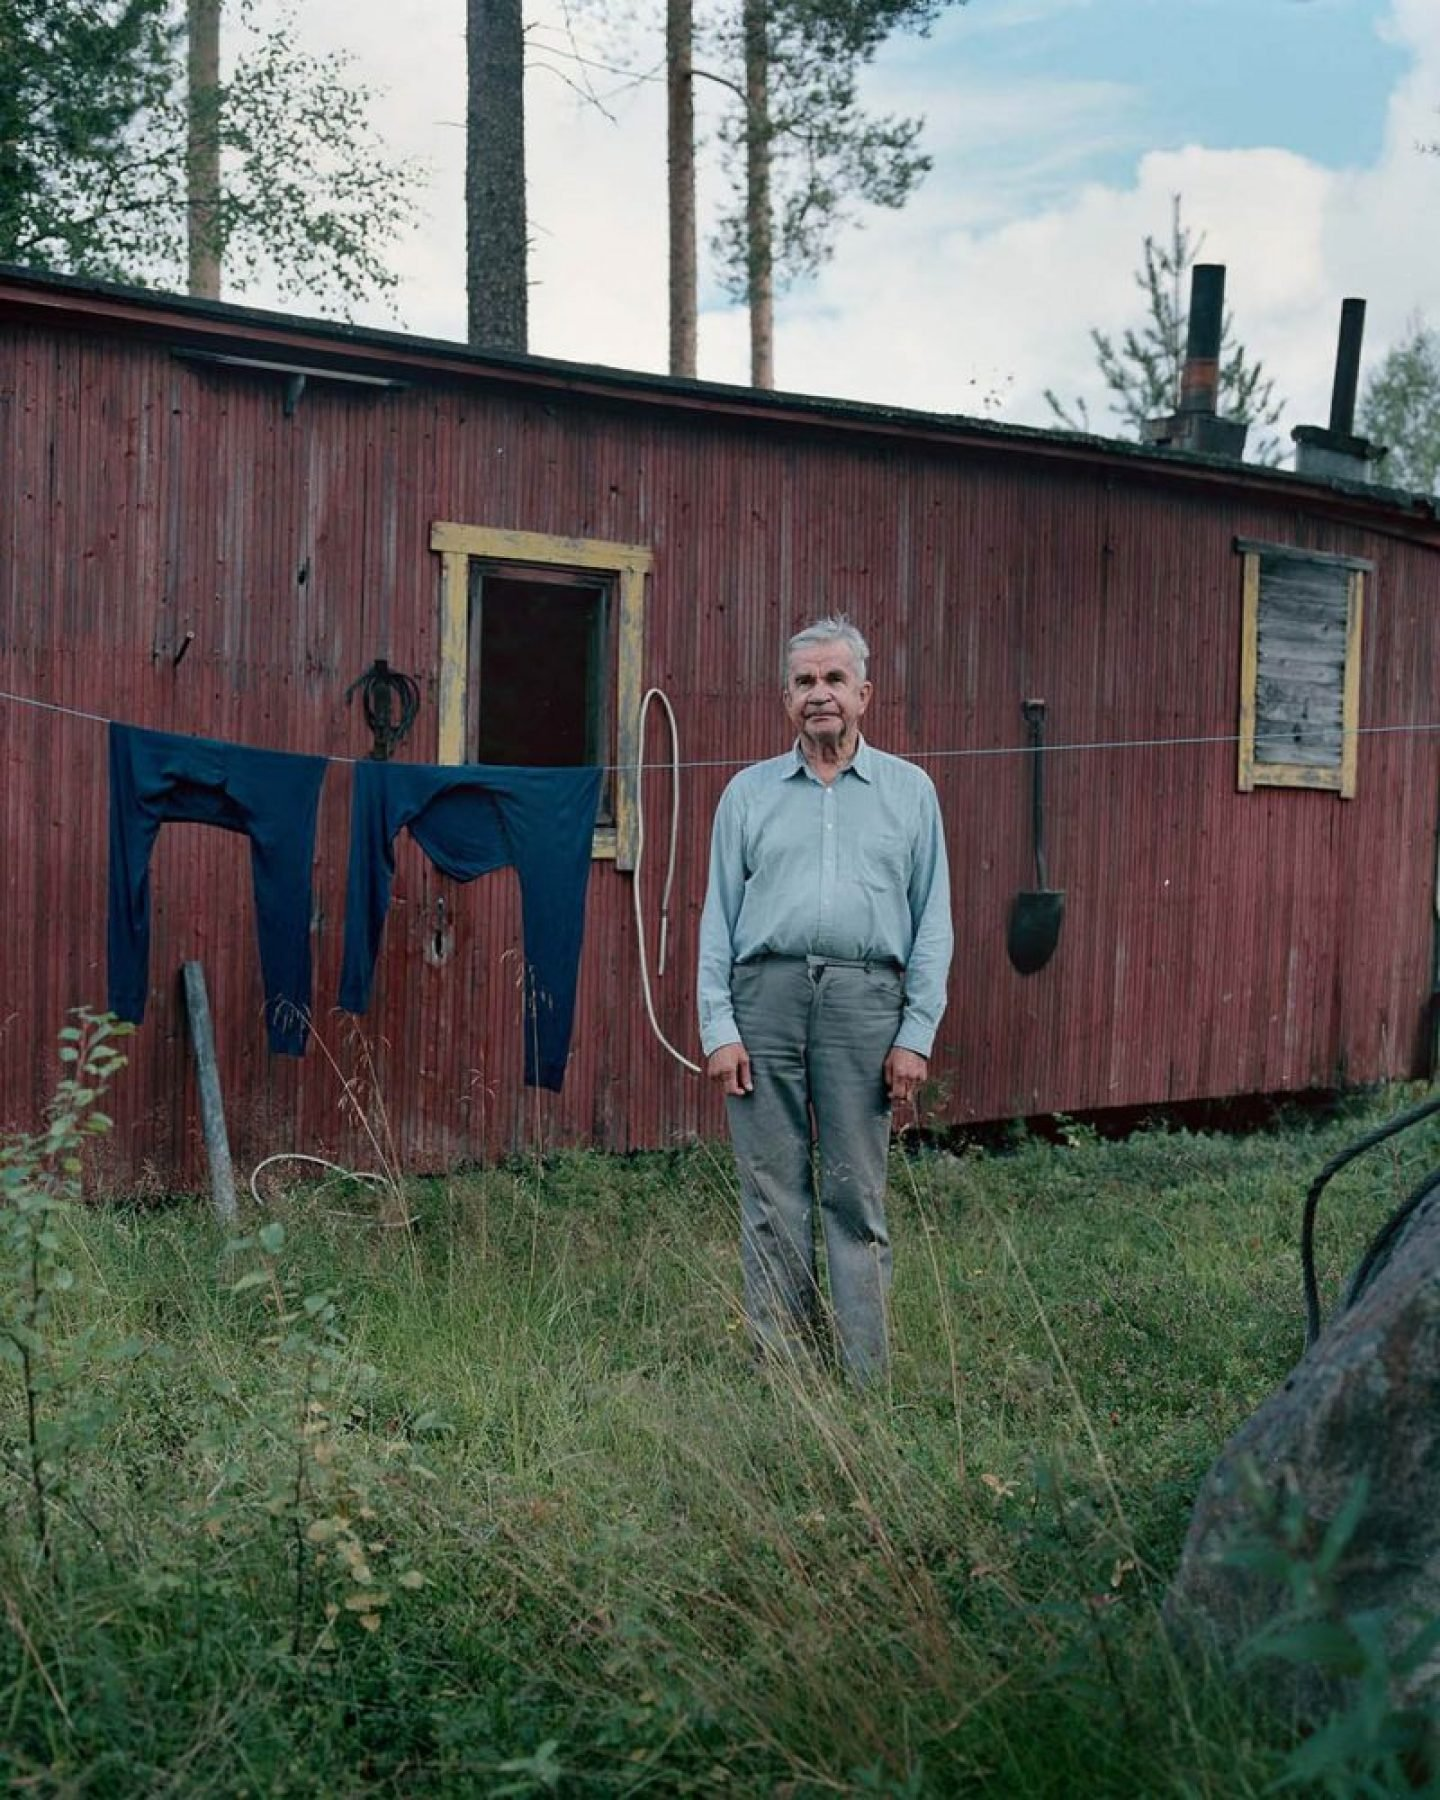 iGNANT_Photography_Aapo_Huhta_Ukkometso_Finland_12